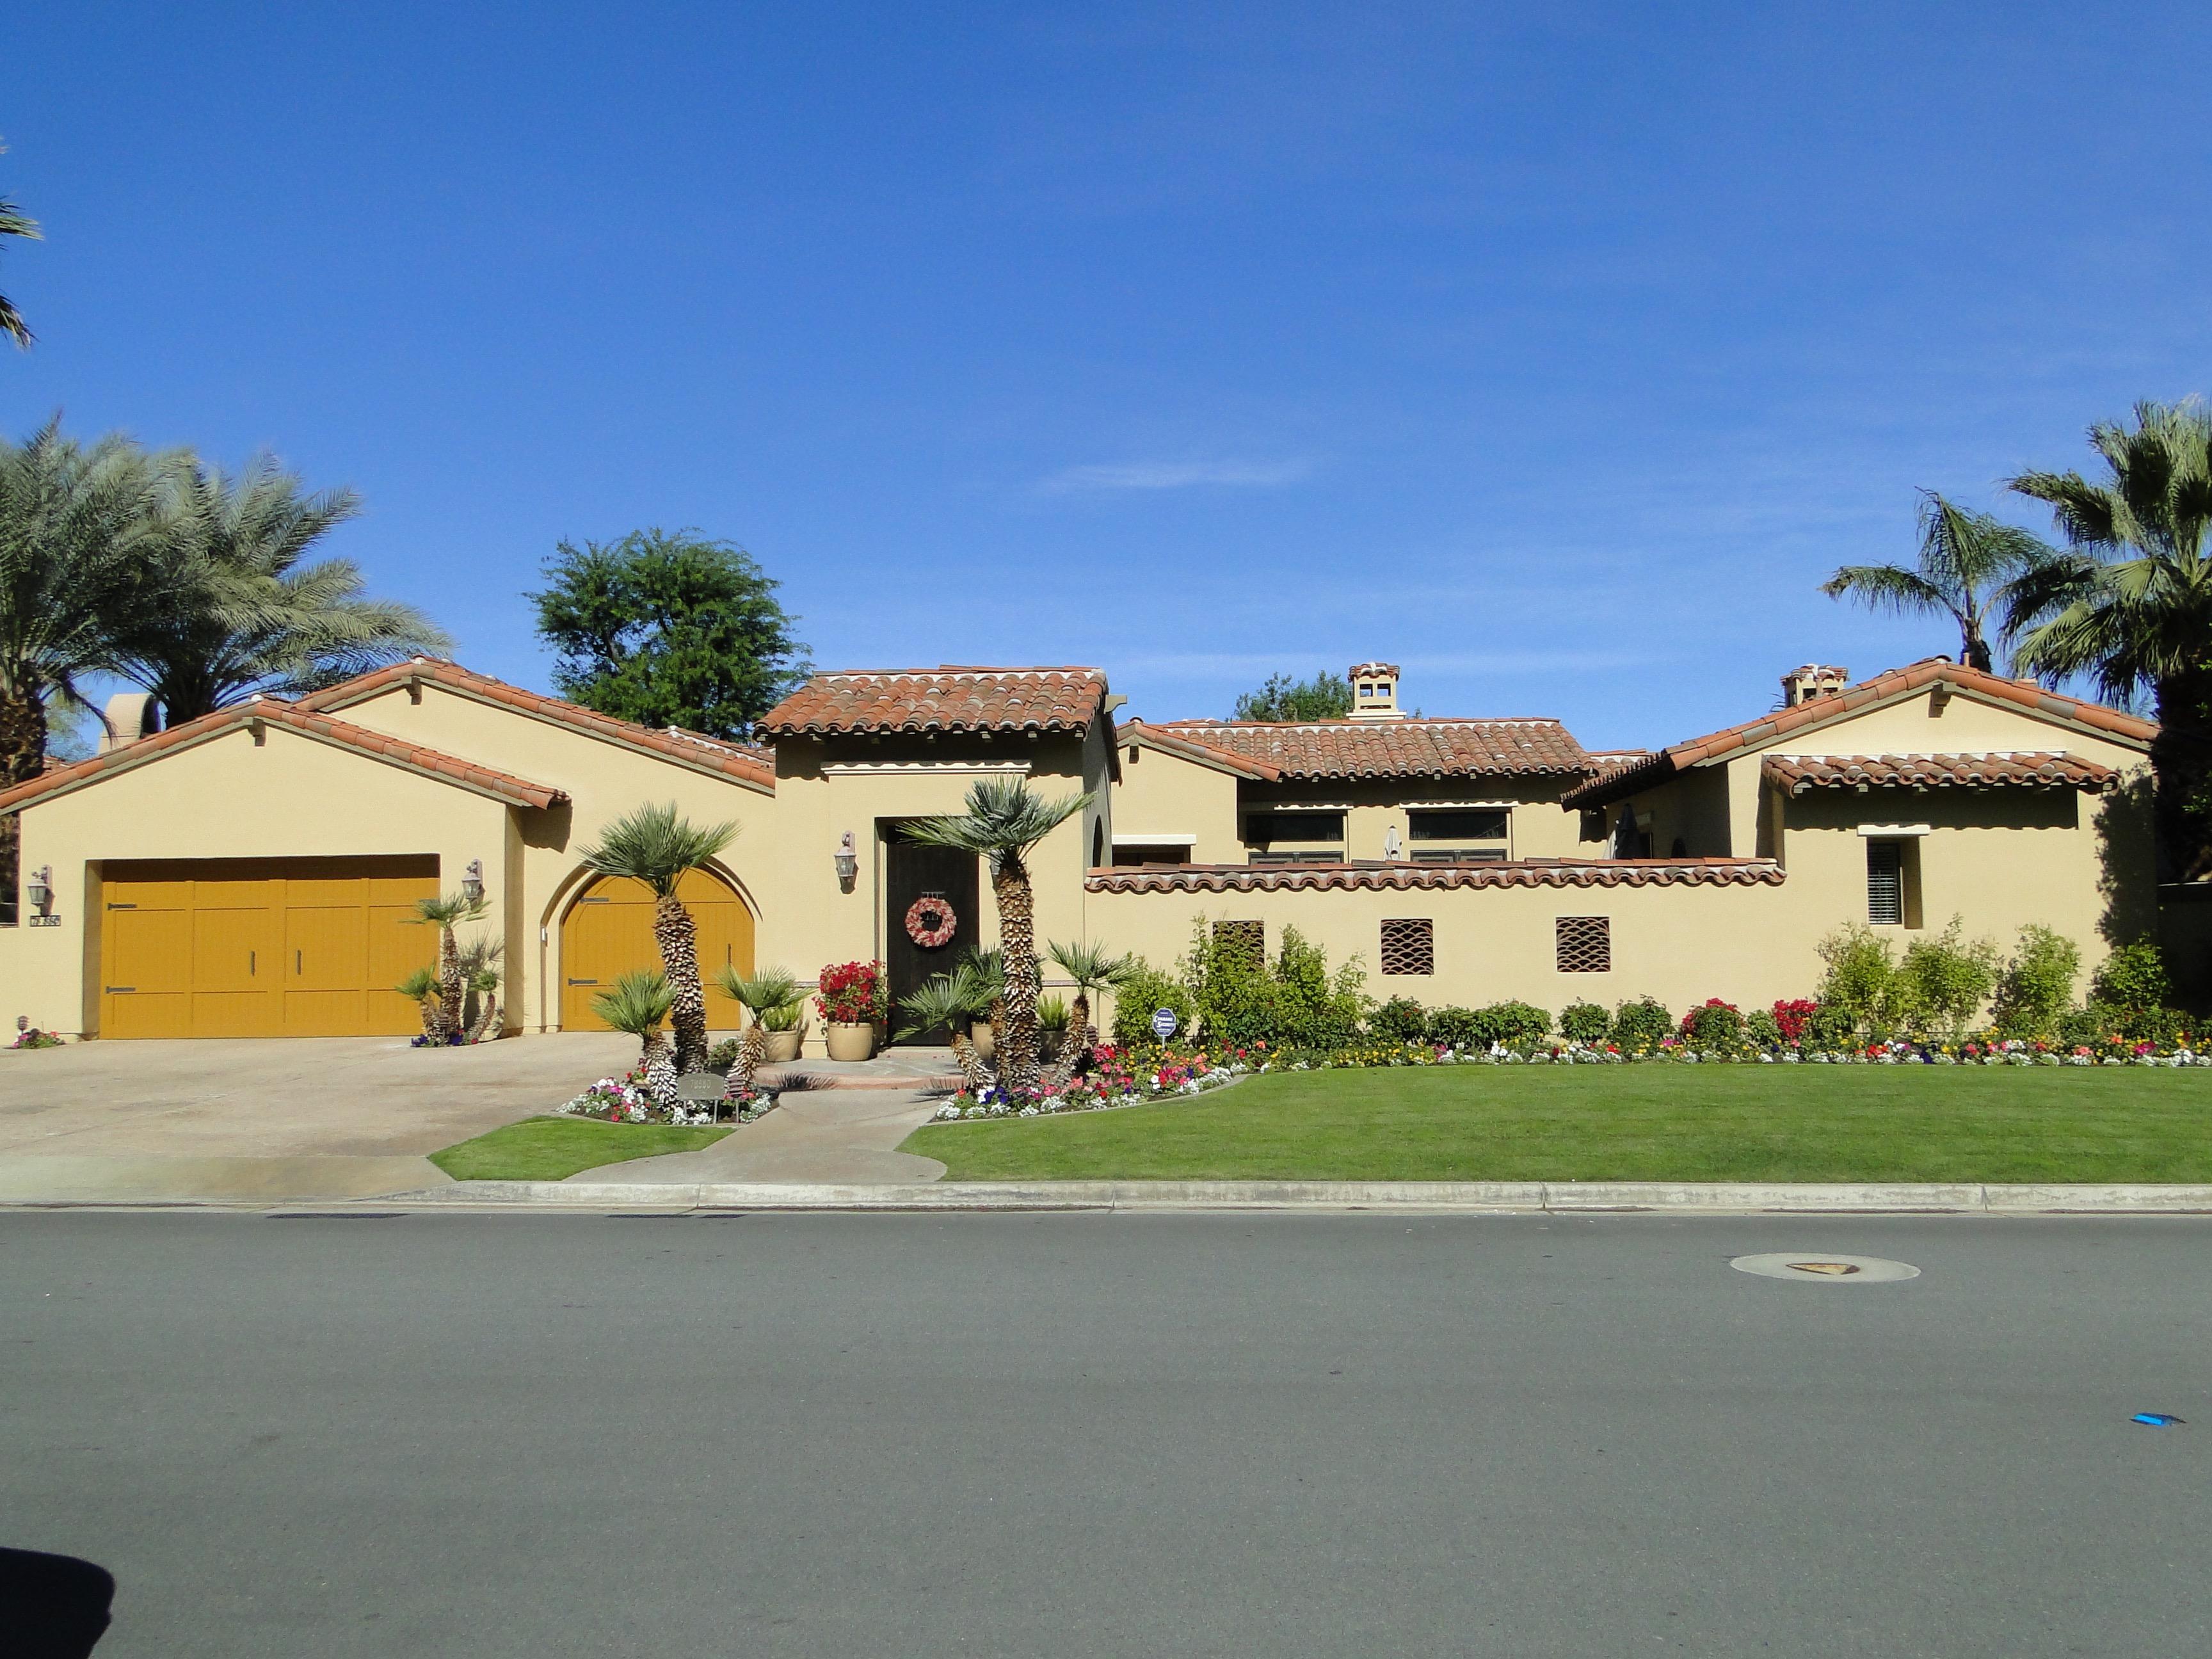 Single Family Home for Sale at 78880 Citrus La Quinta, California, 92253 United States